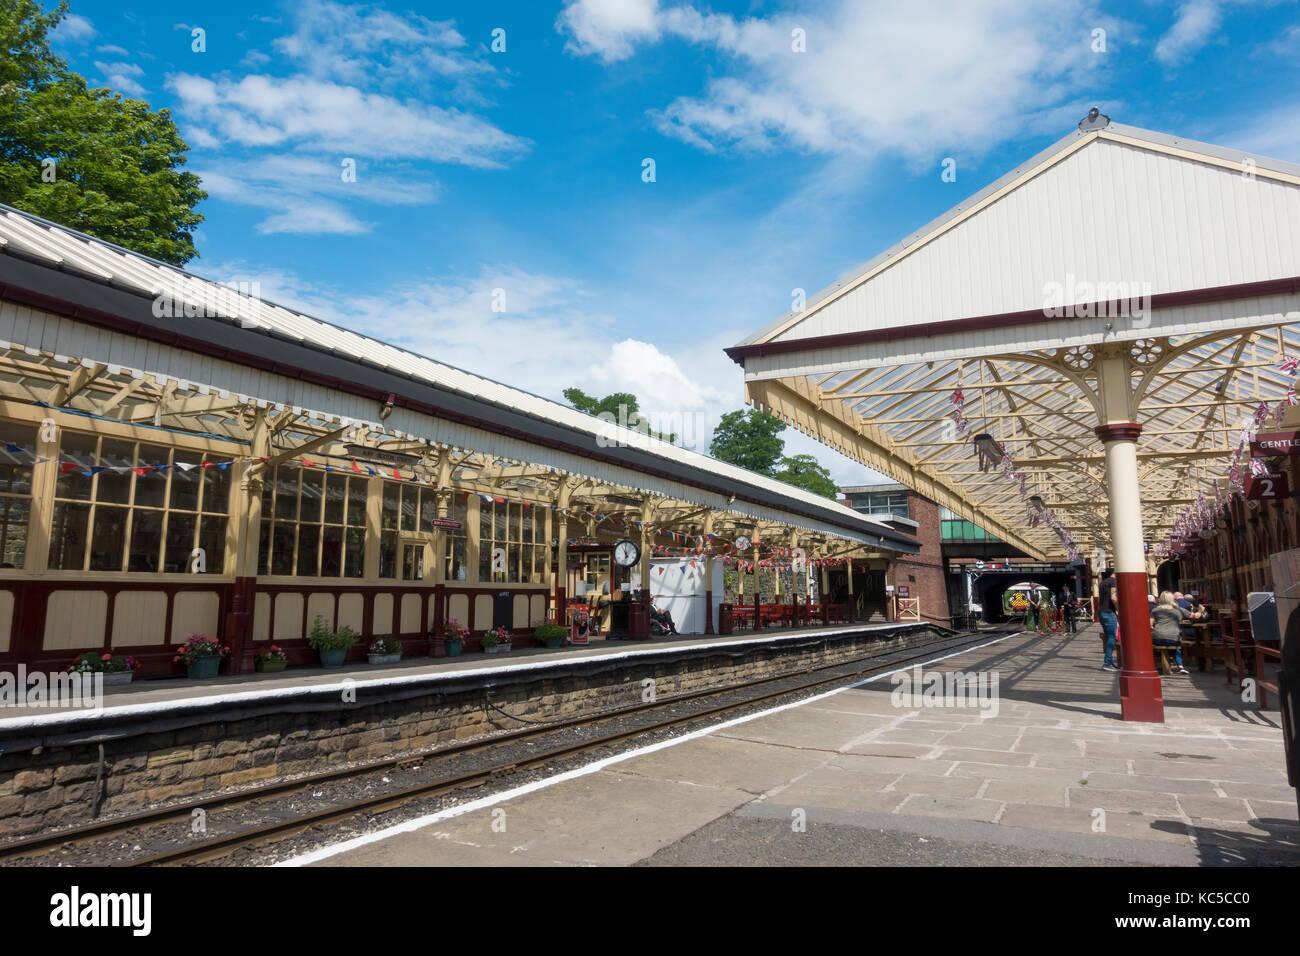 Railway Platform at Bolton Street Station, Bury on the East Lancashire Railway - Stock Image